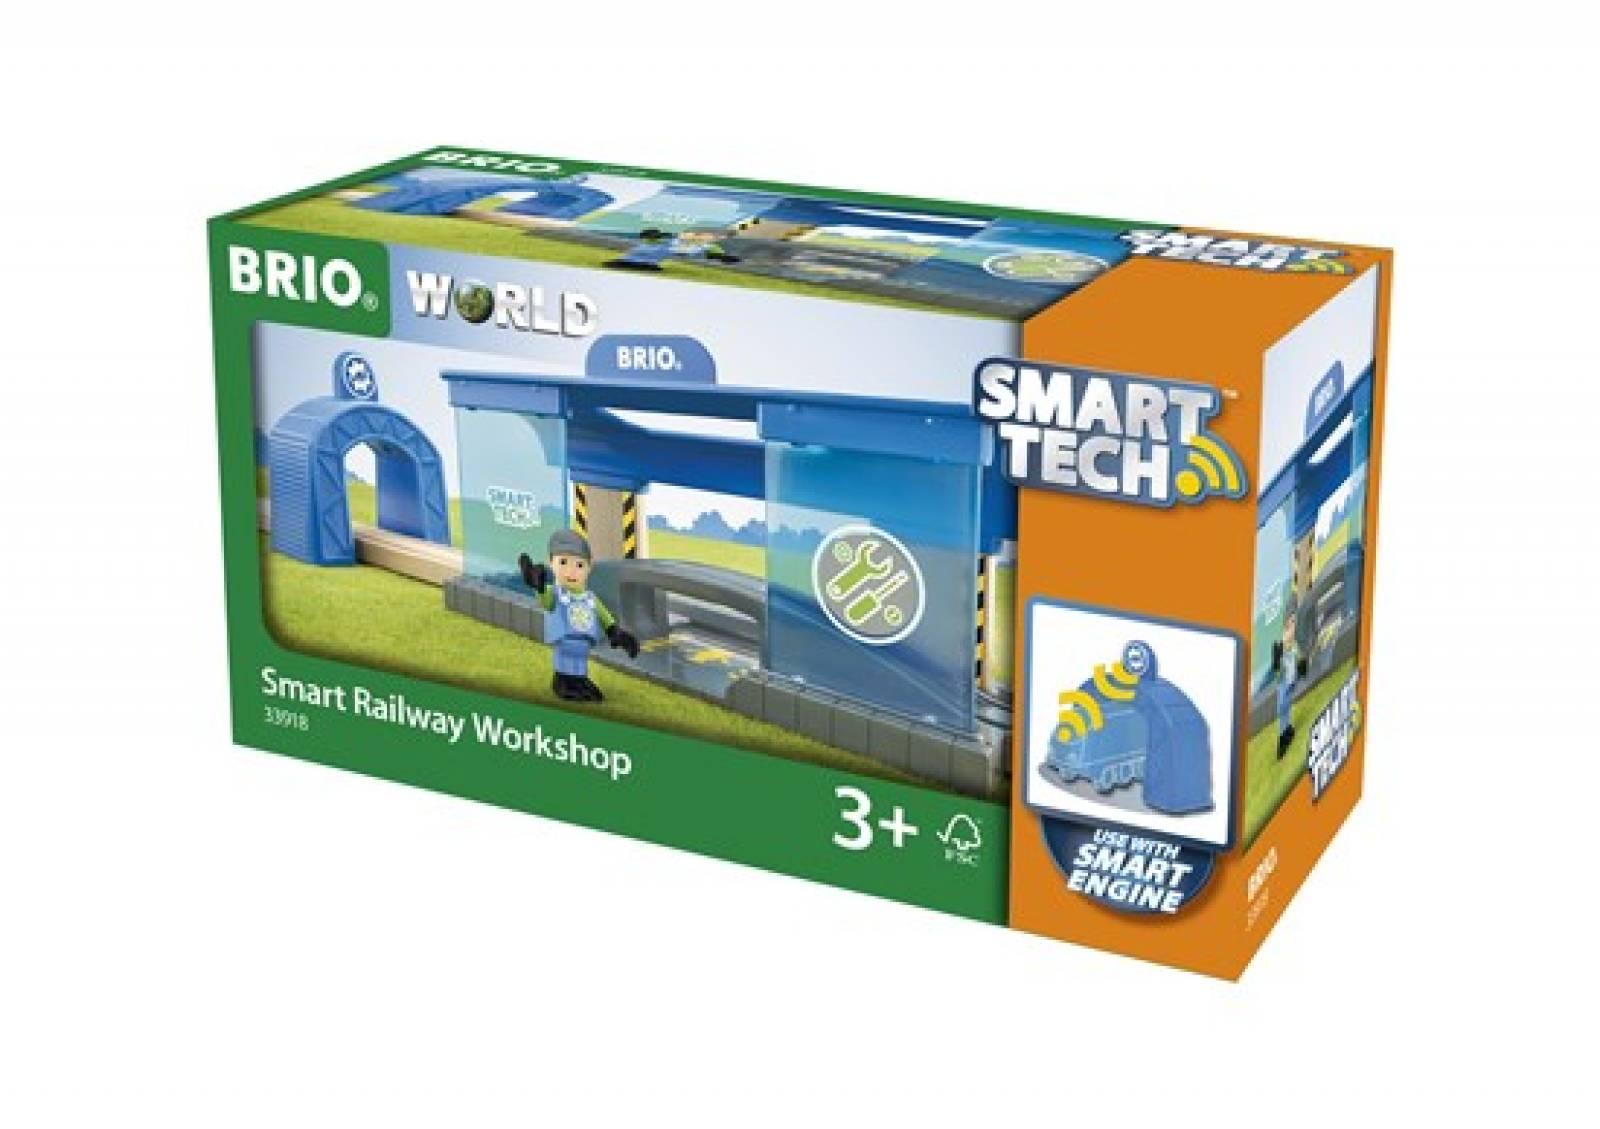 Smart Tech Railway Workshop BRIO Wooden Railway Age 3+